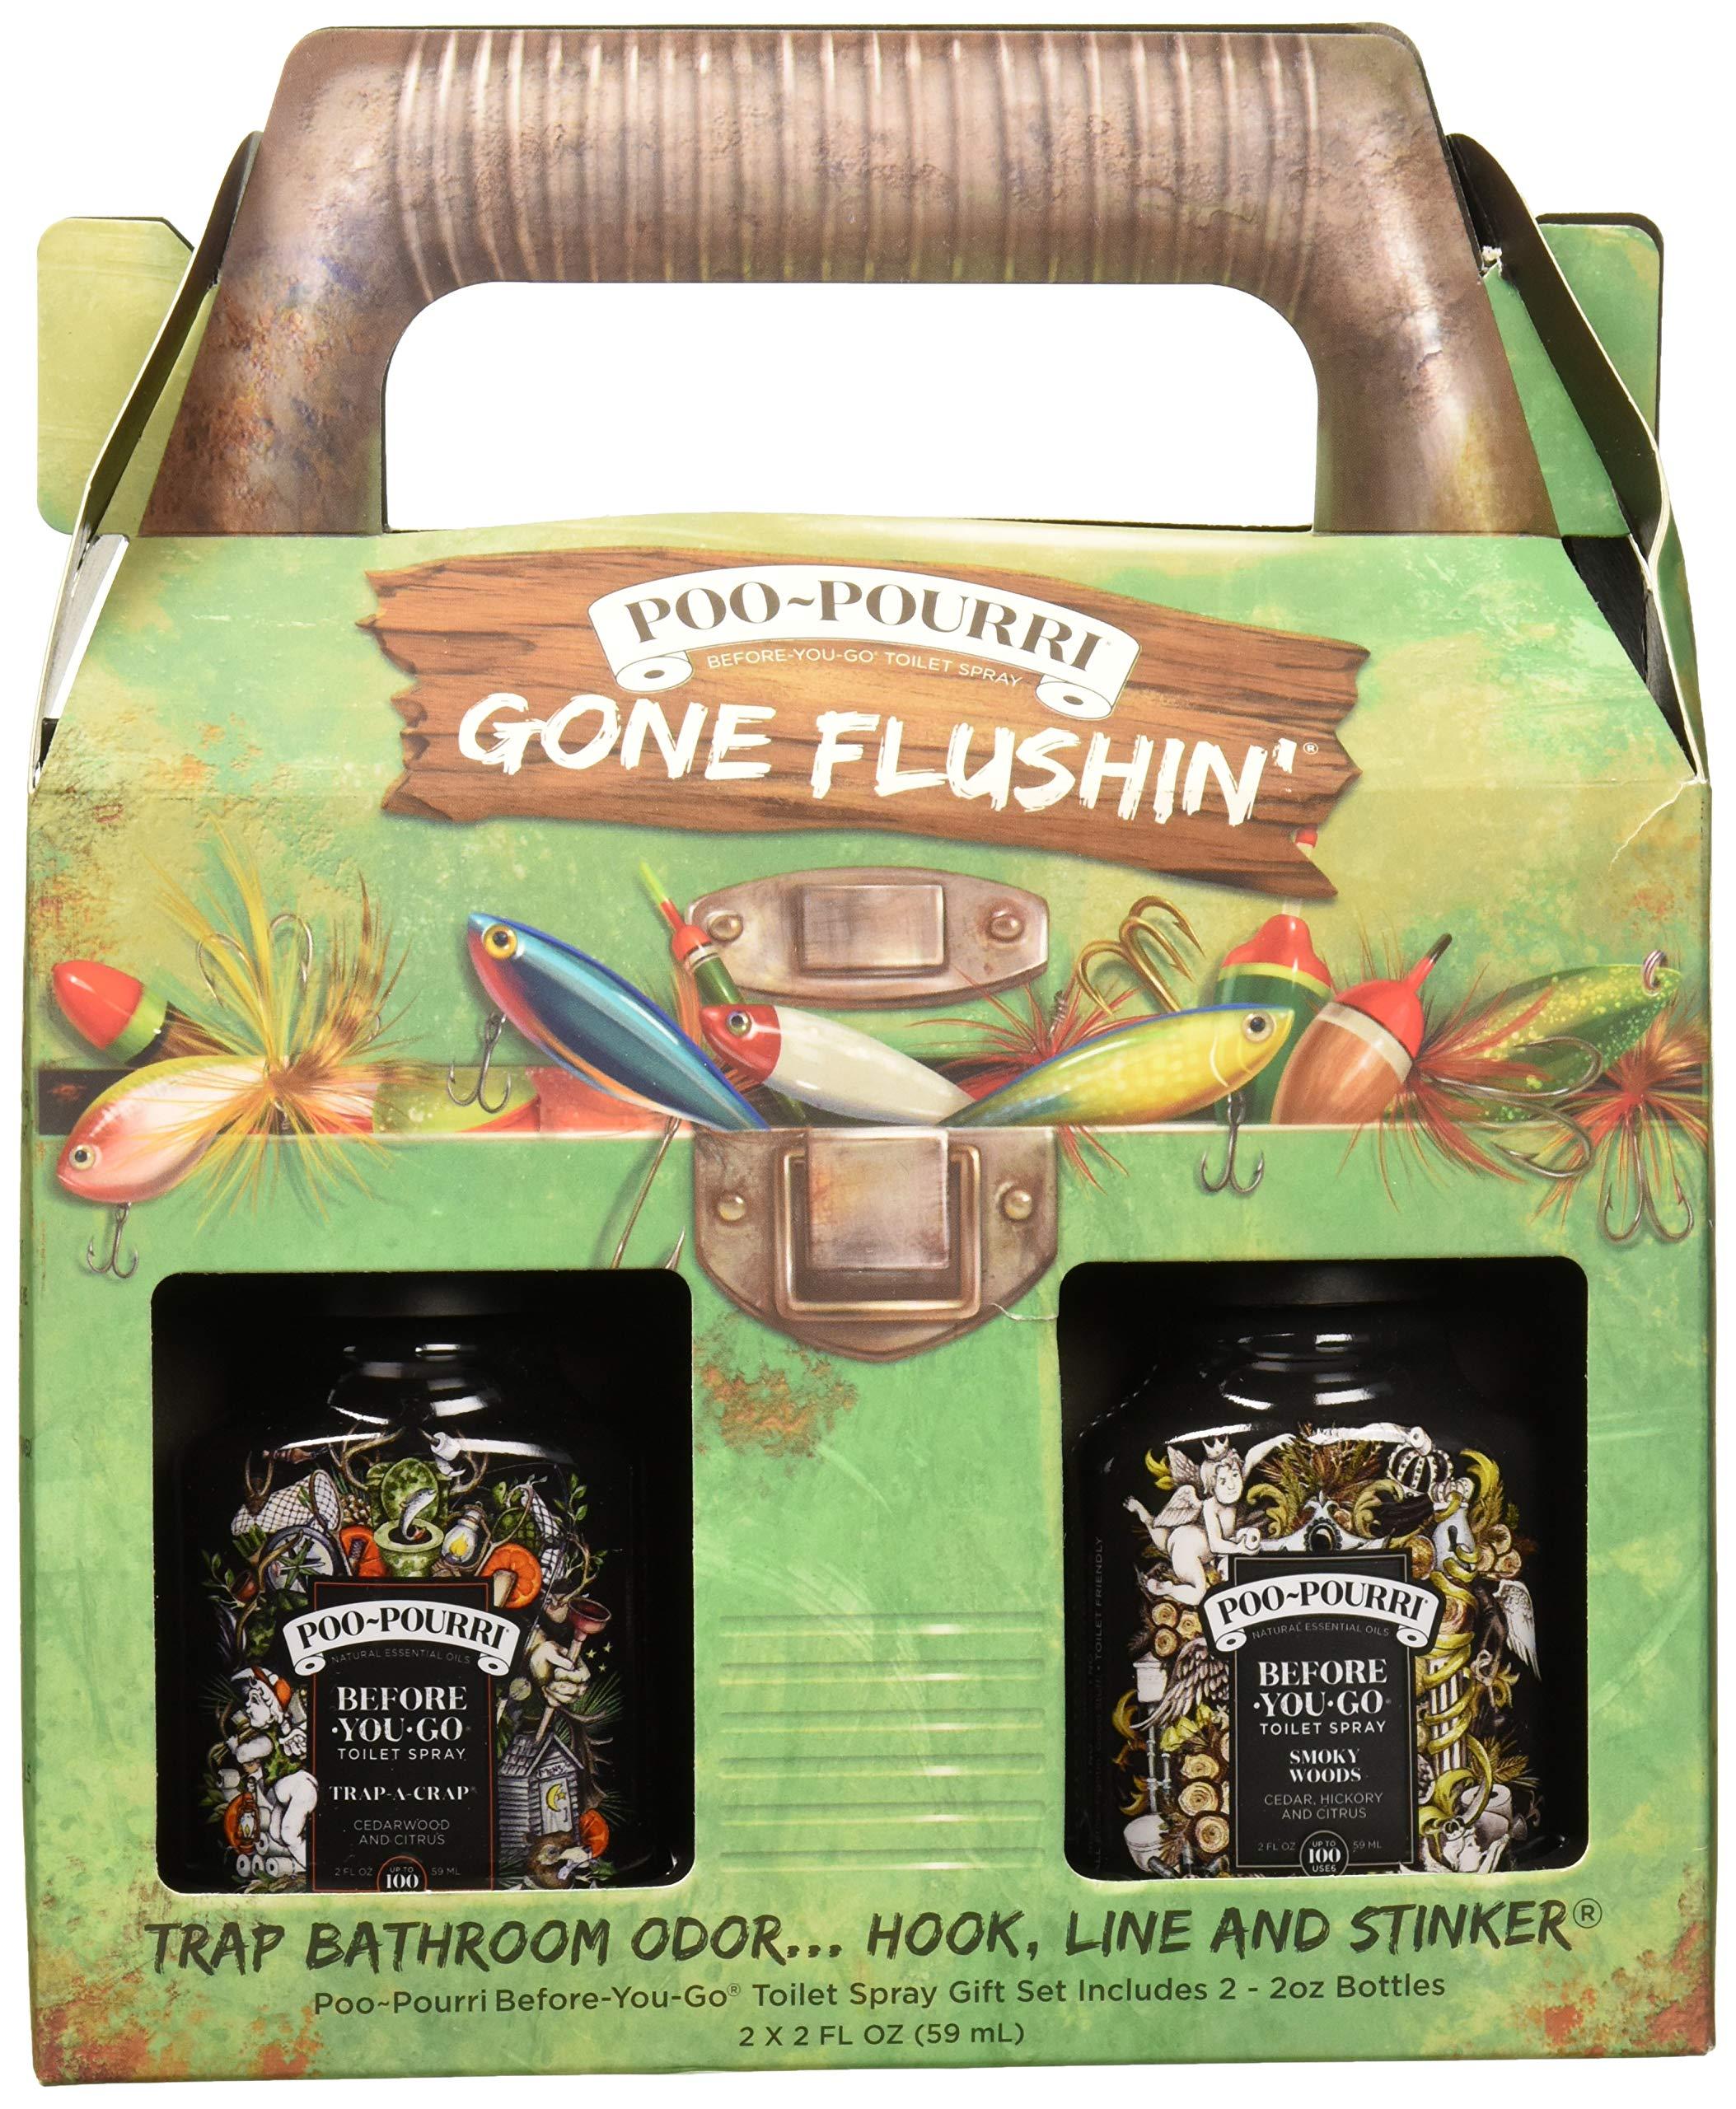 Poo-Pourri Gone Flushin Before You Go Toilet Spray Gift Set in Tackle Box by Poo-Pourri (Image #1)